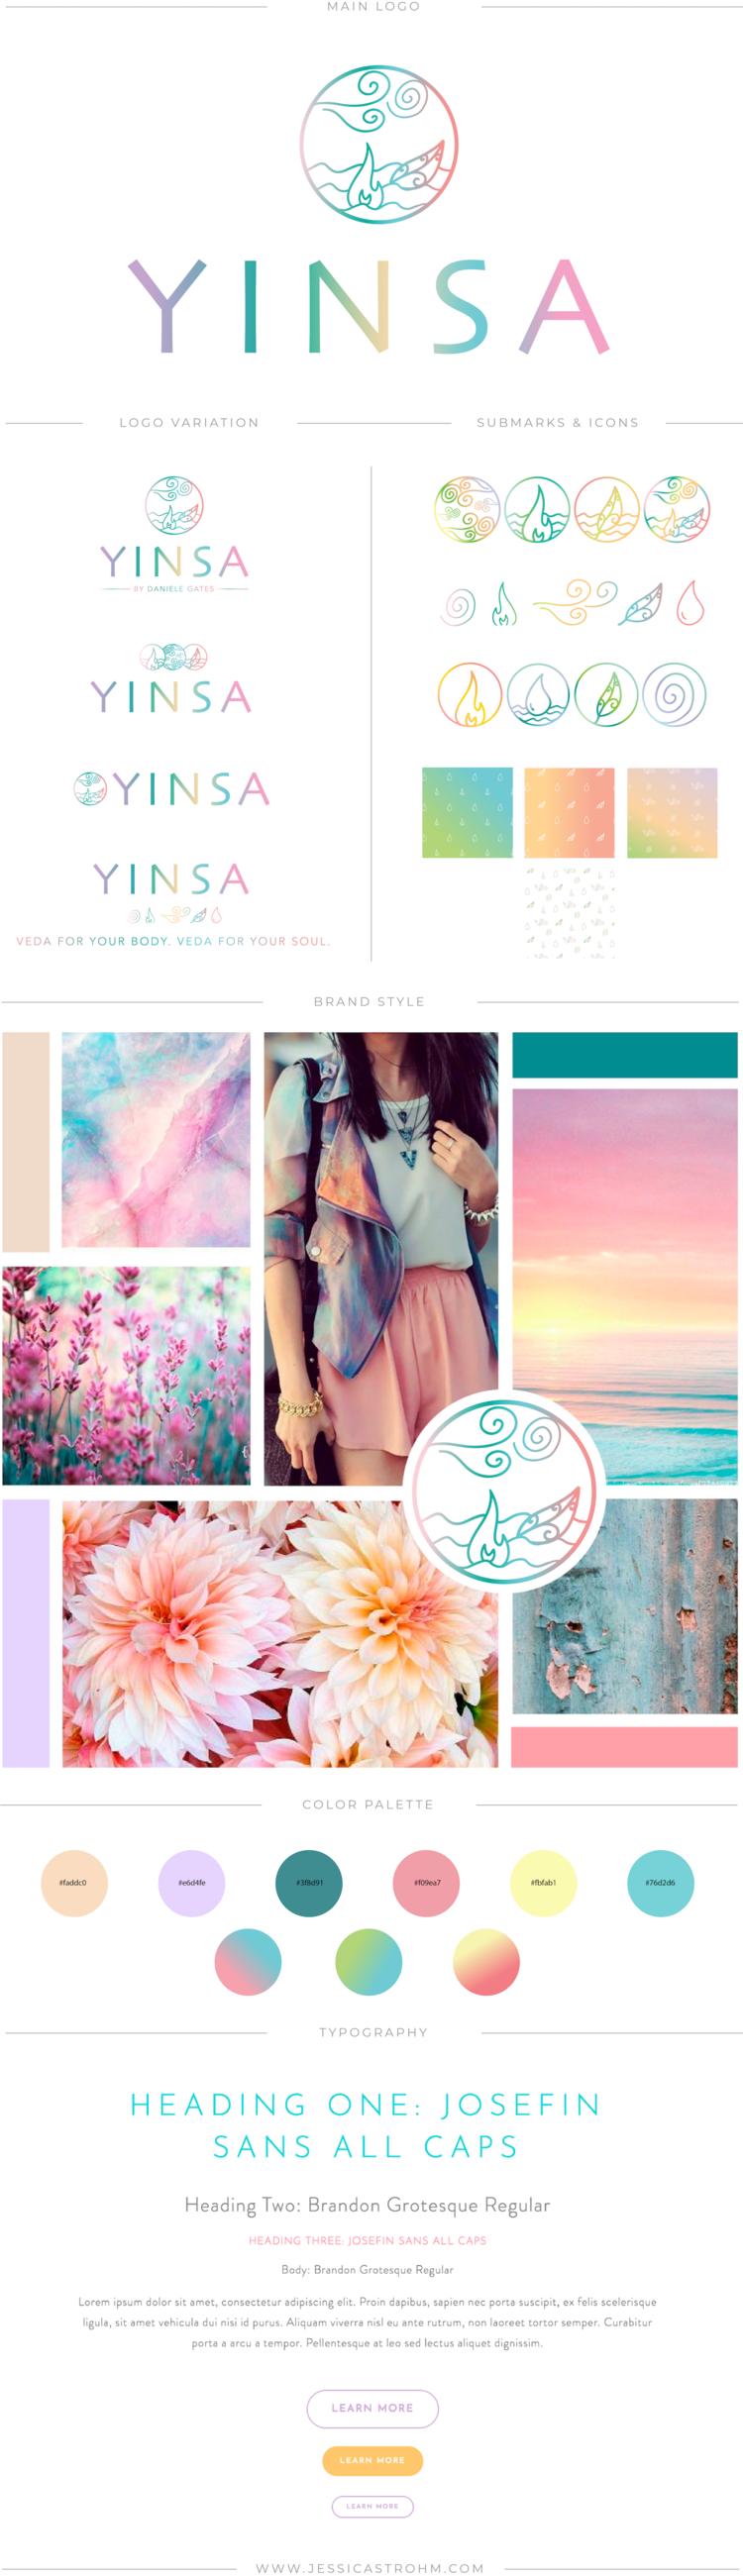 Yinsa+Brand+Website+Mood+Board.png